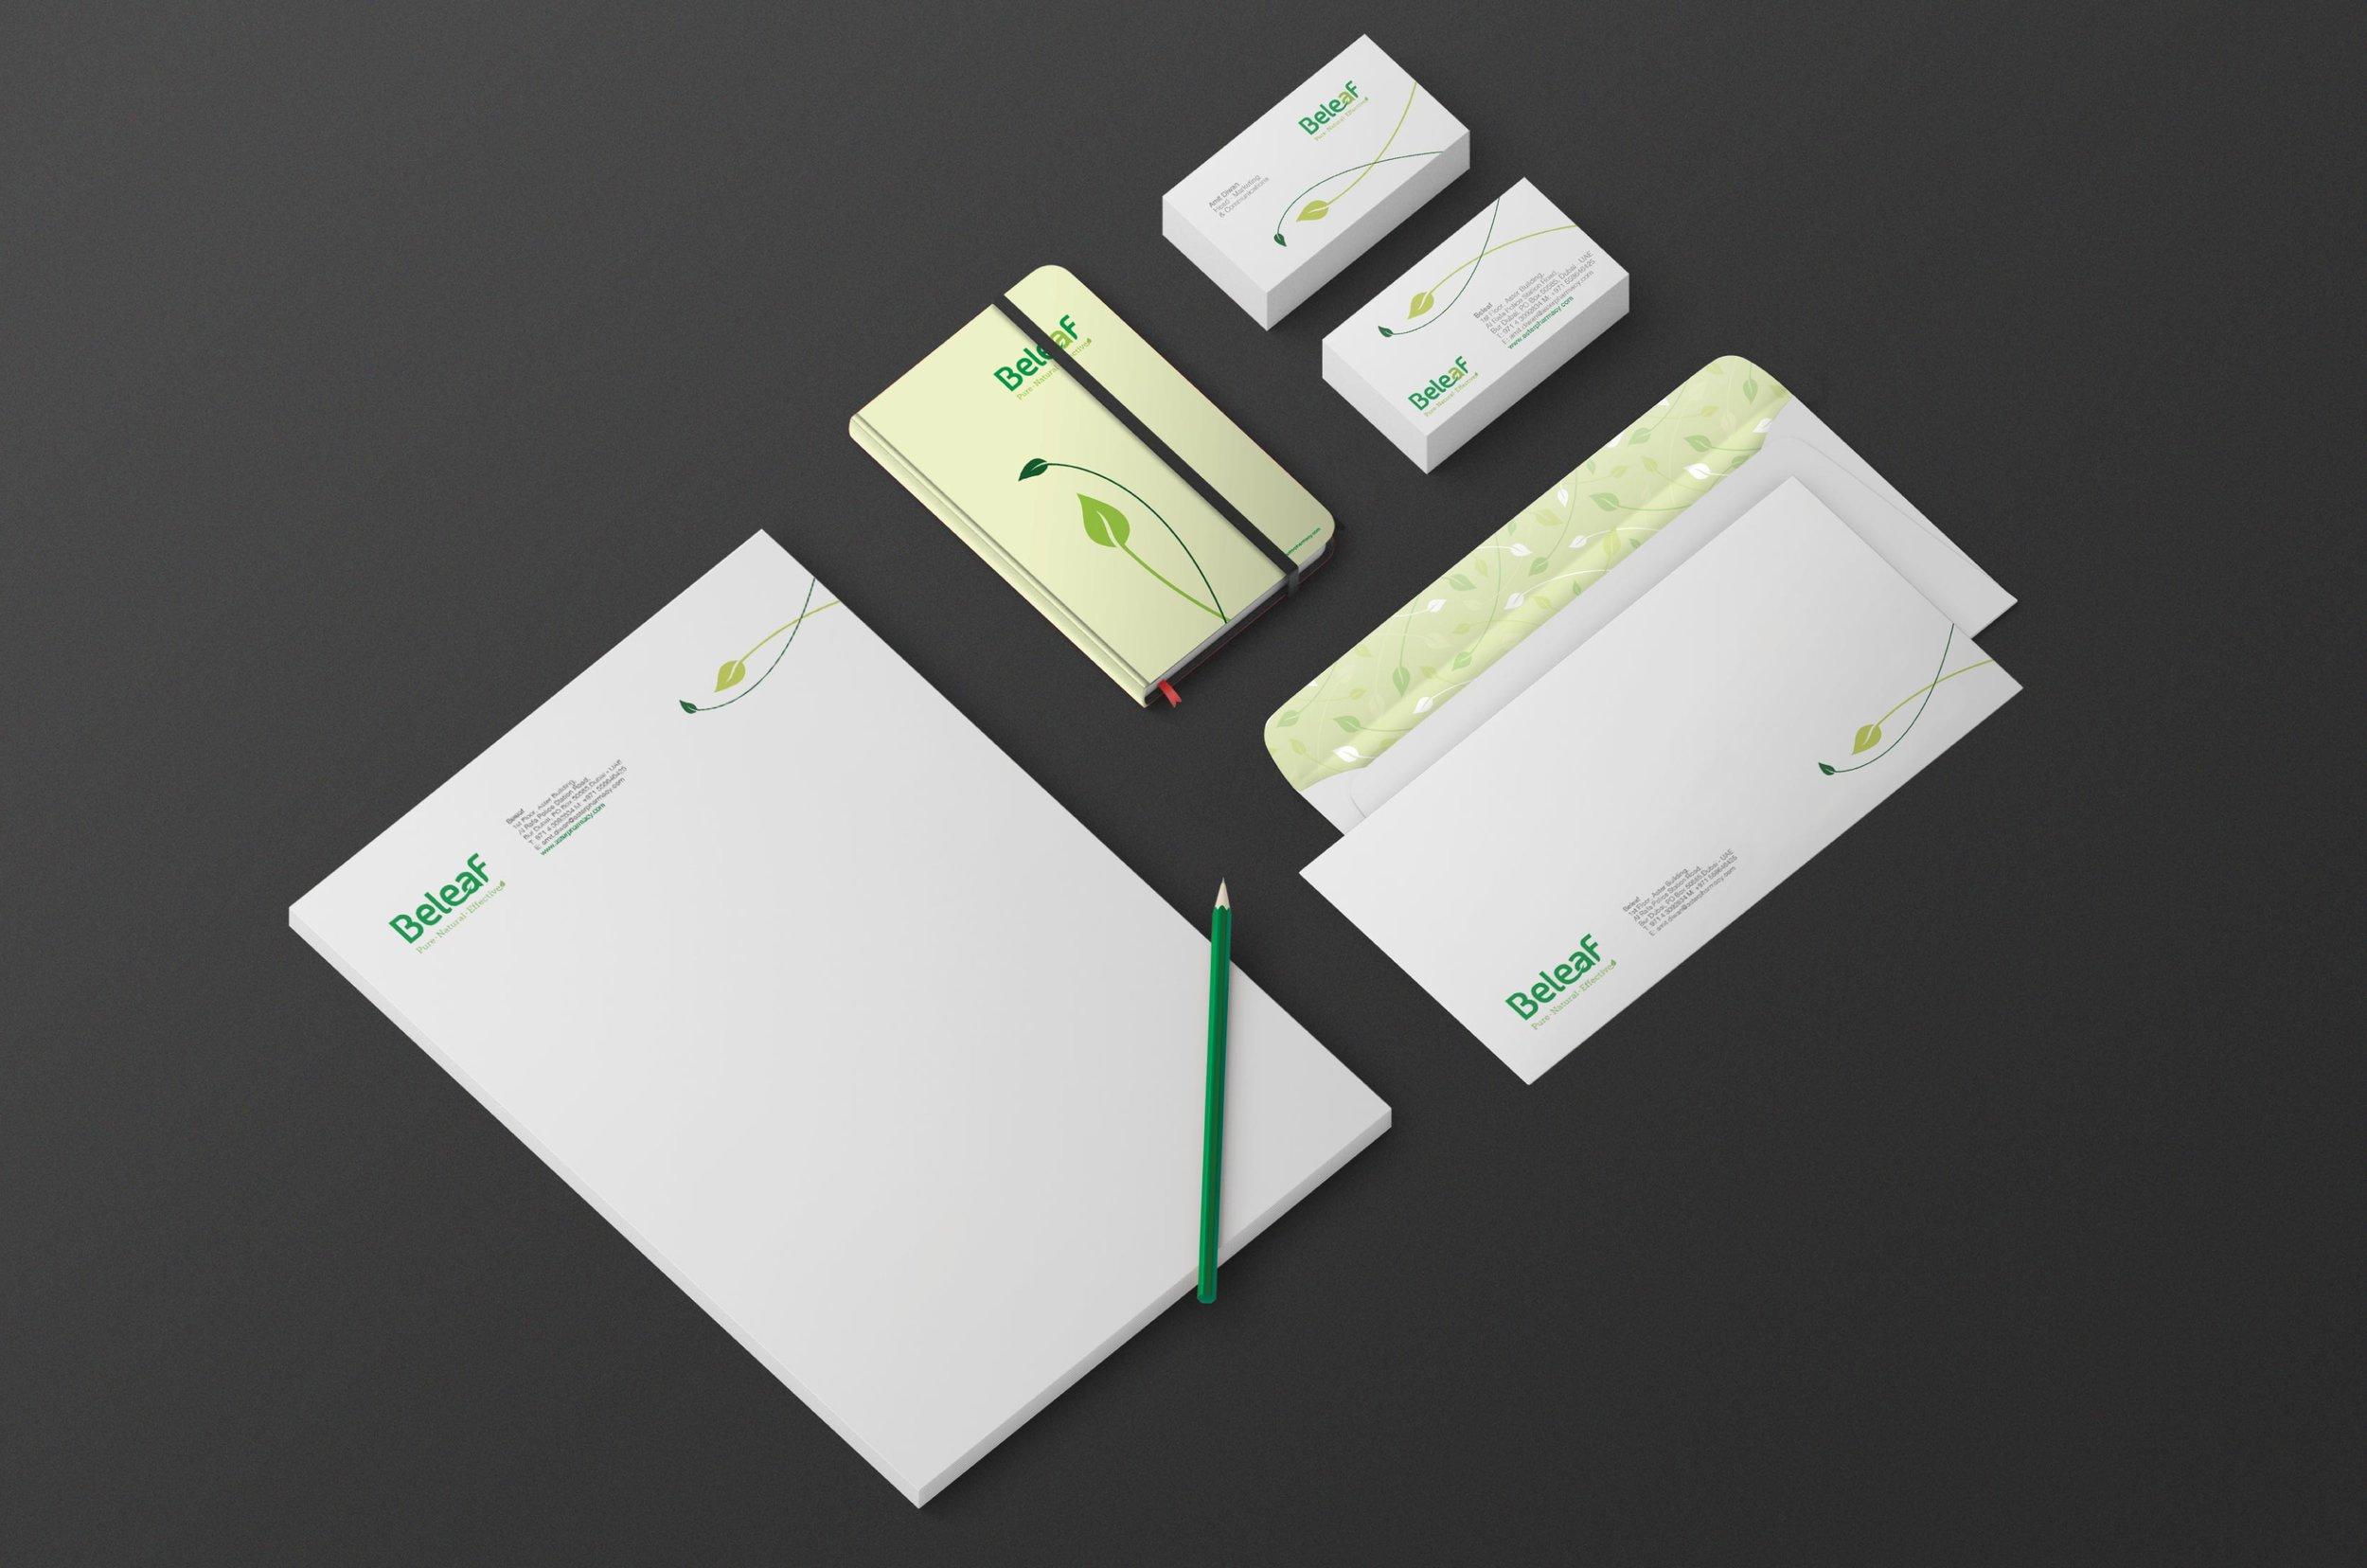 Beleaf_Branding_Elephant Design 2.jpg